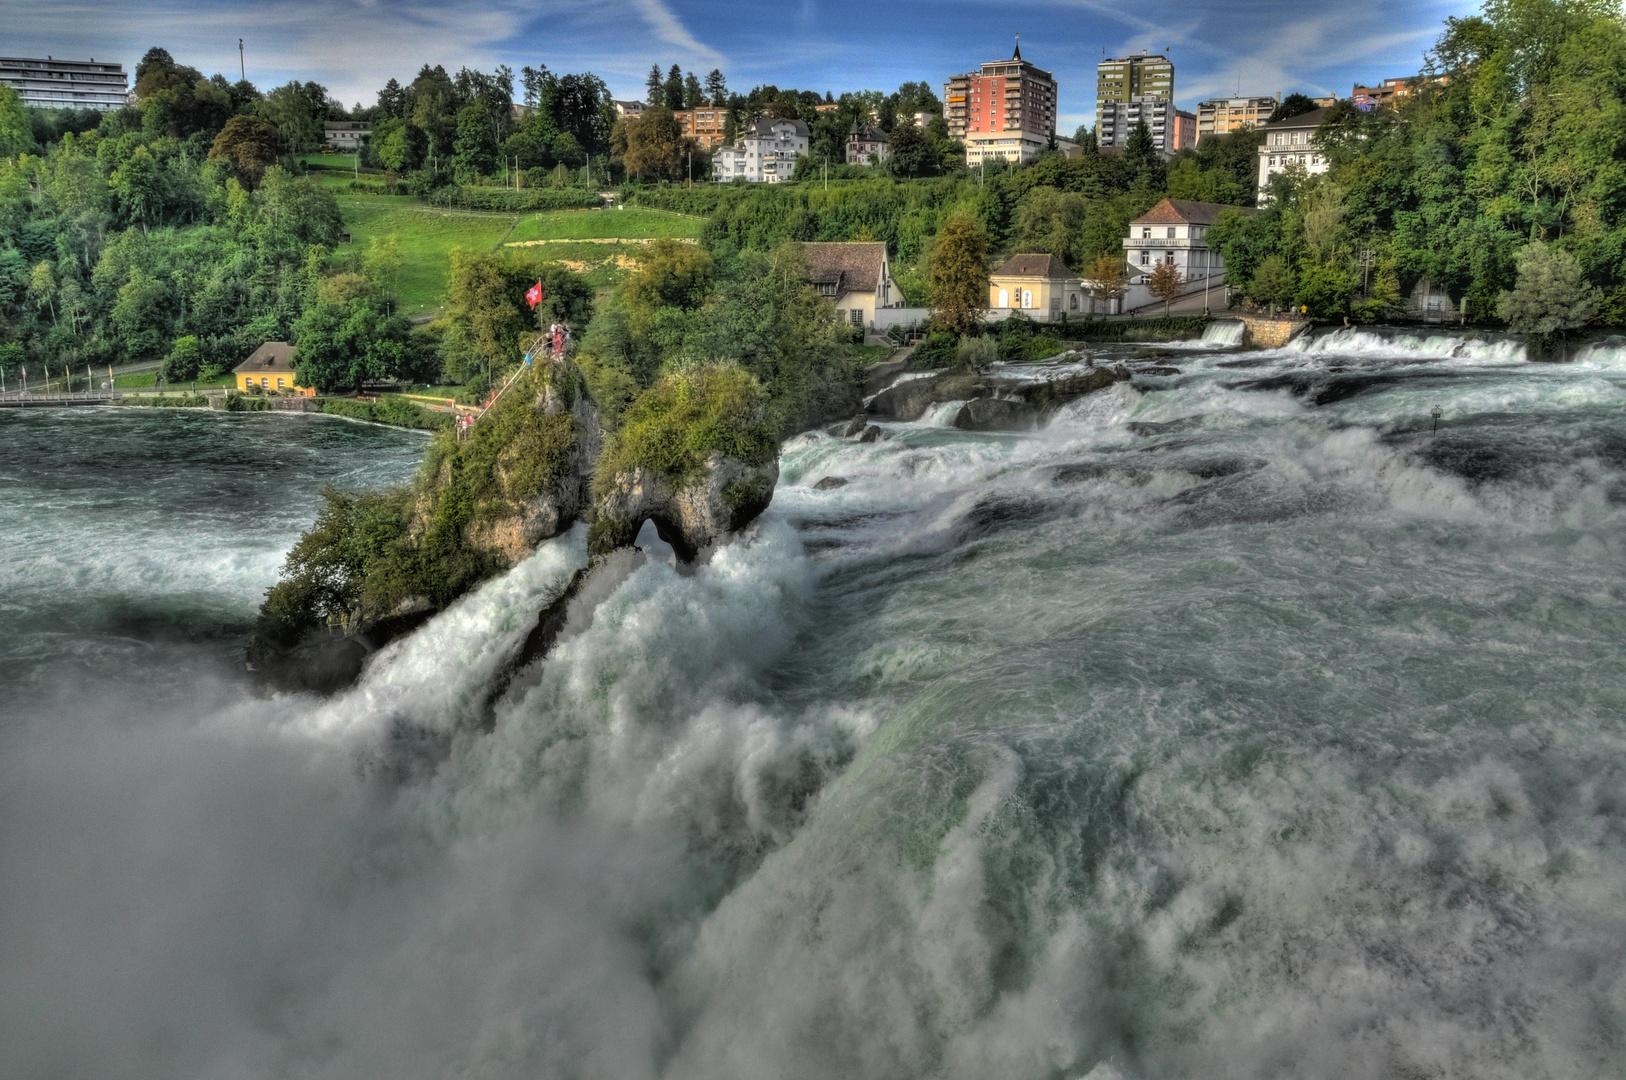 Wasserfall / Rheinfall